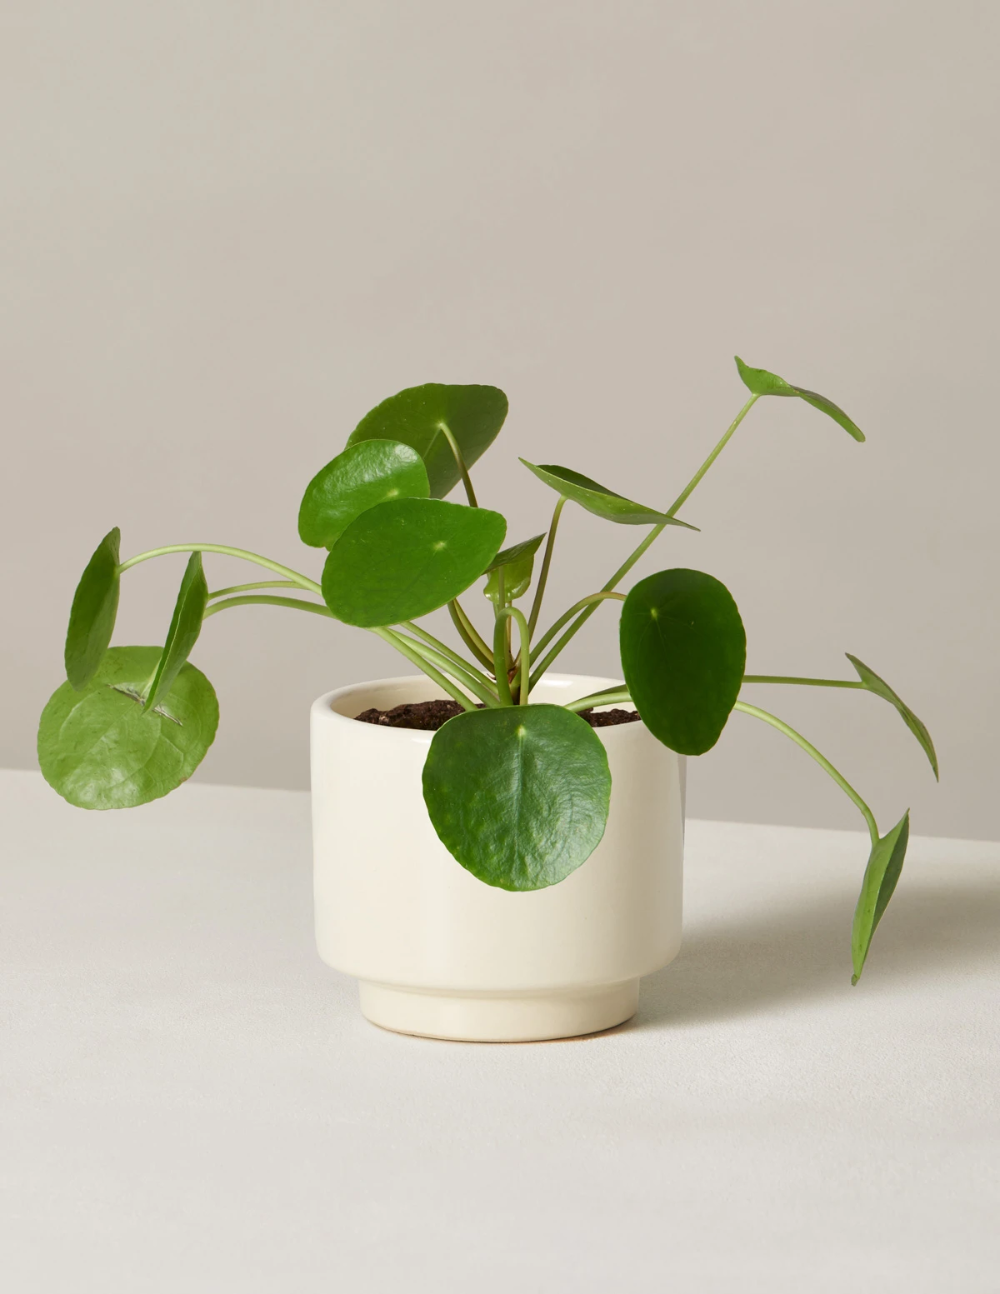 Pilea Peperomioides -   17 planting Indoor desk ideas